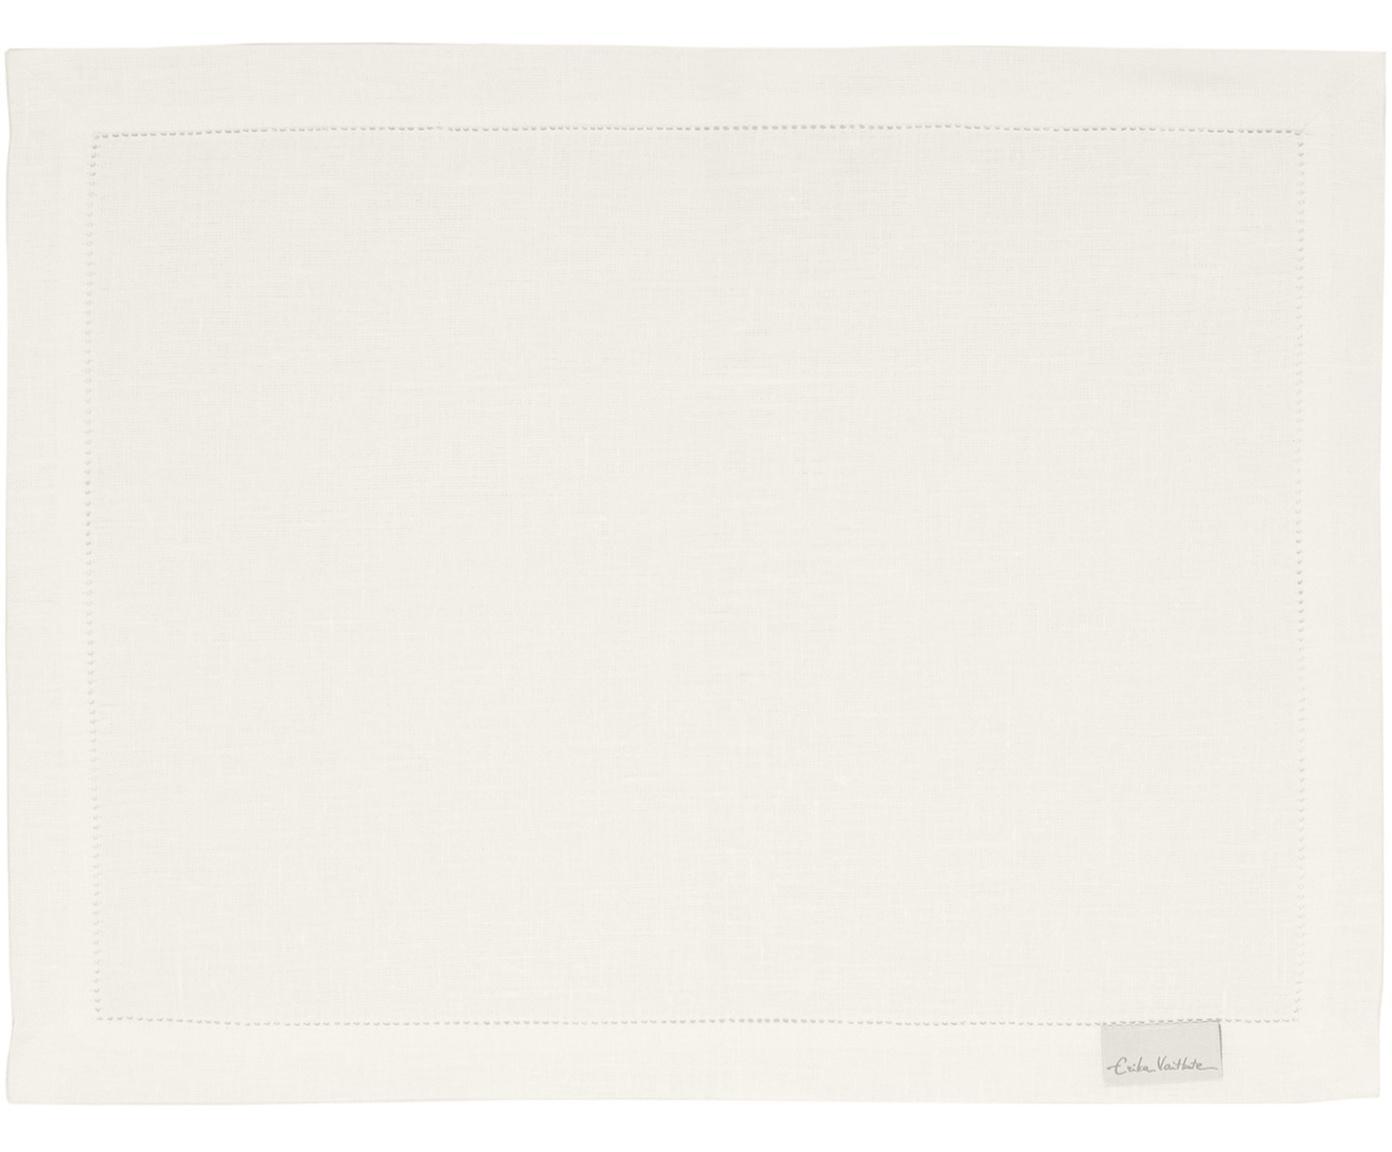 Podkładka z lnu Alanta, 6 szt., Kremowy, 38 x 50 cm